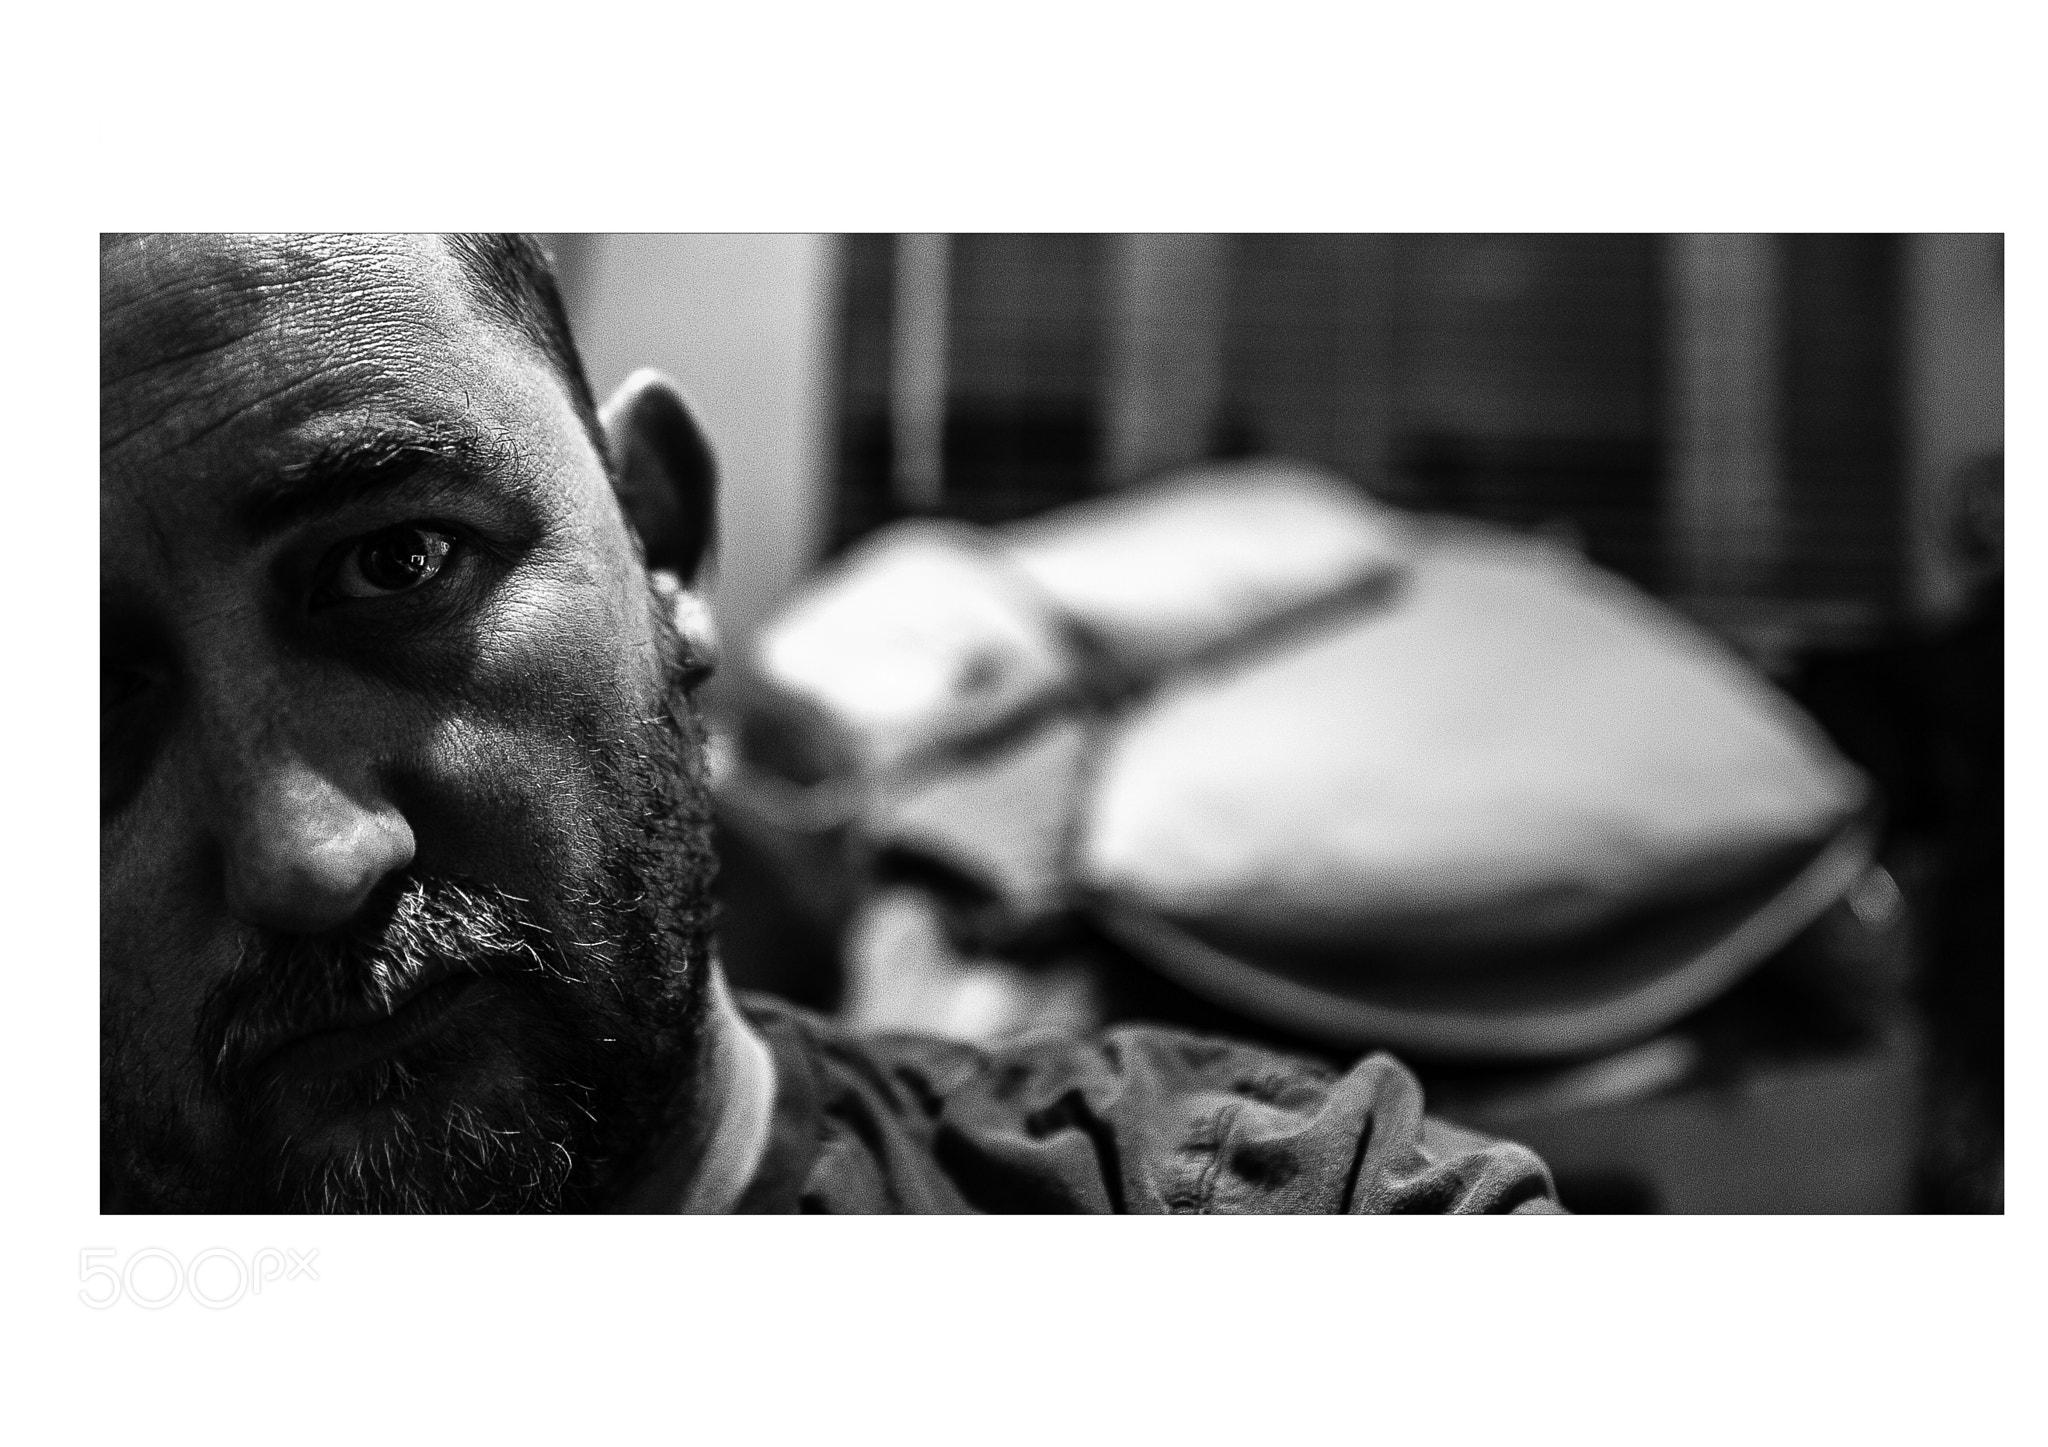 Photograph Self Portrait, 2 by Adam Abbott on 500px